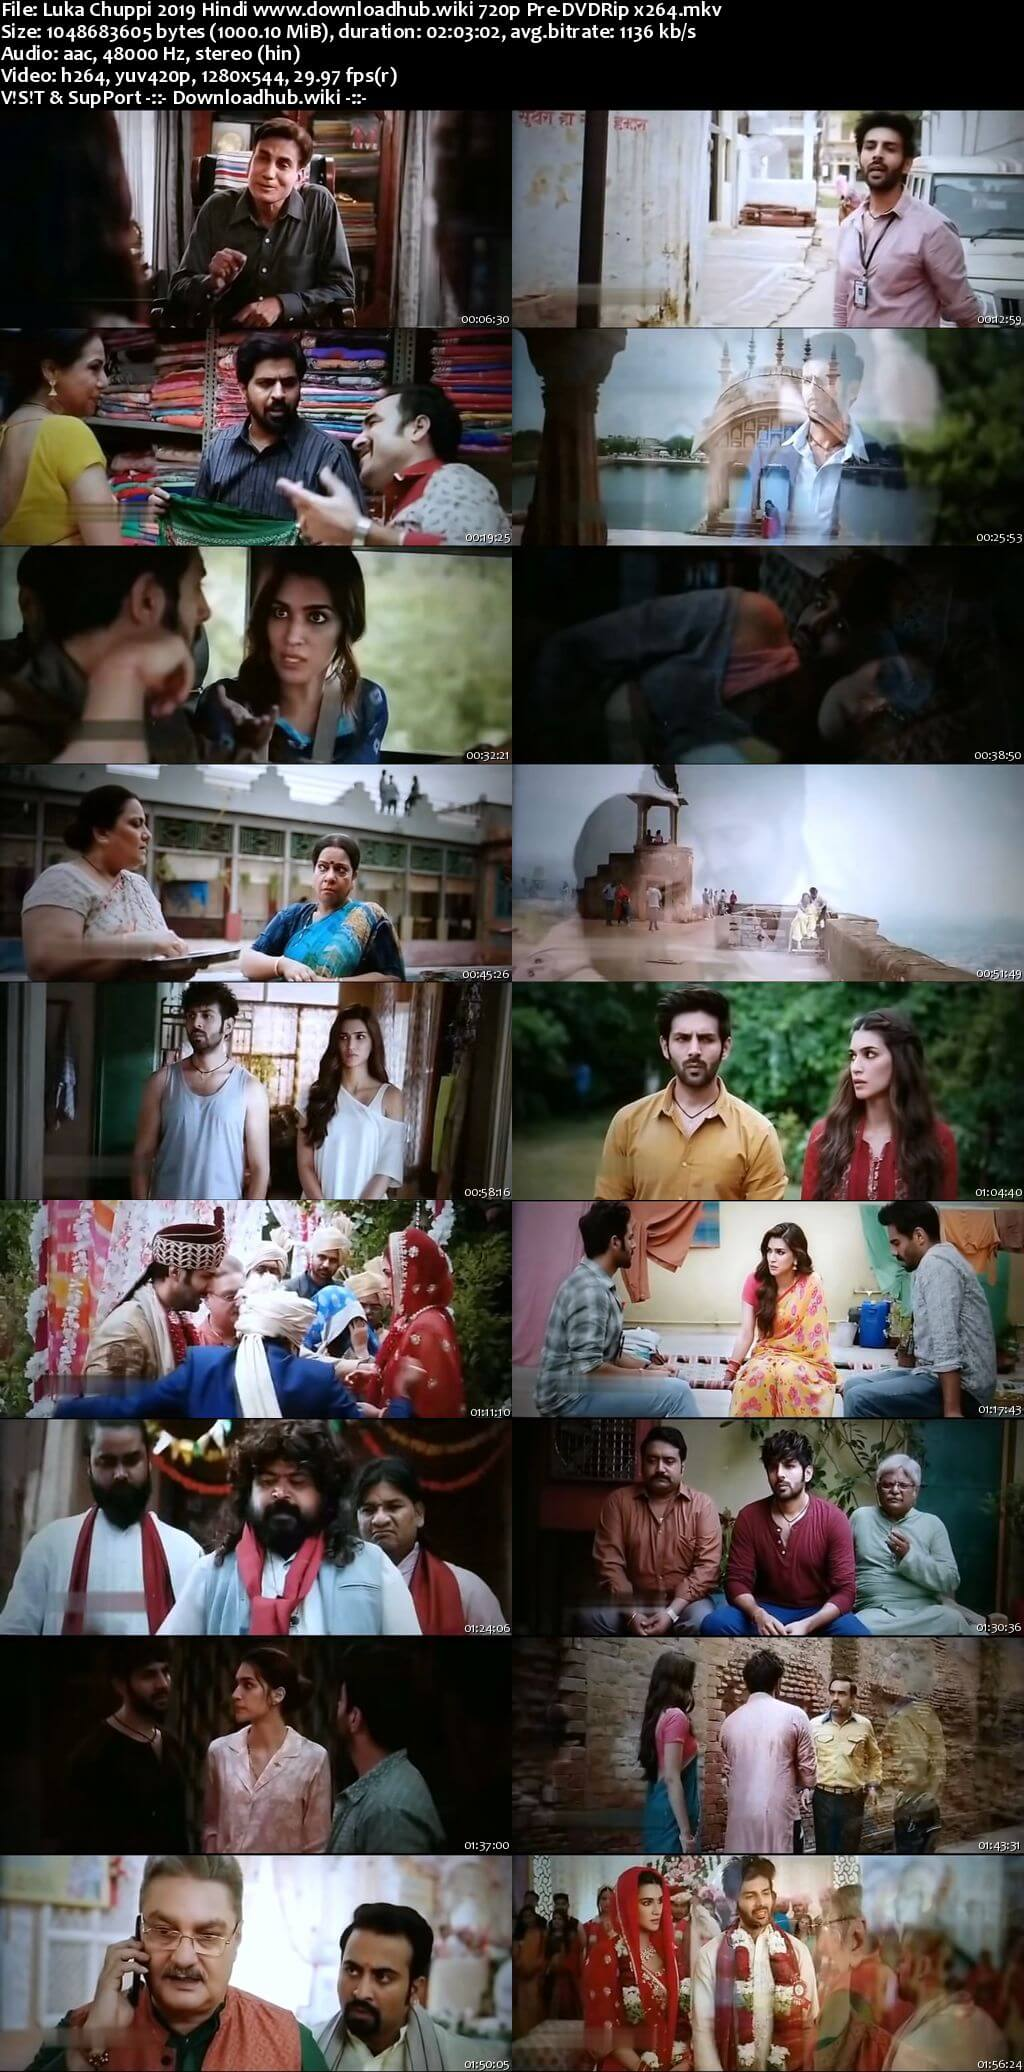 Luka Chuppi 2019 Hindi 720p Pre-DVDRip x264